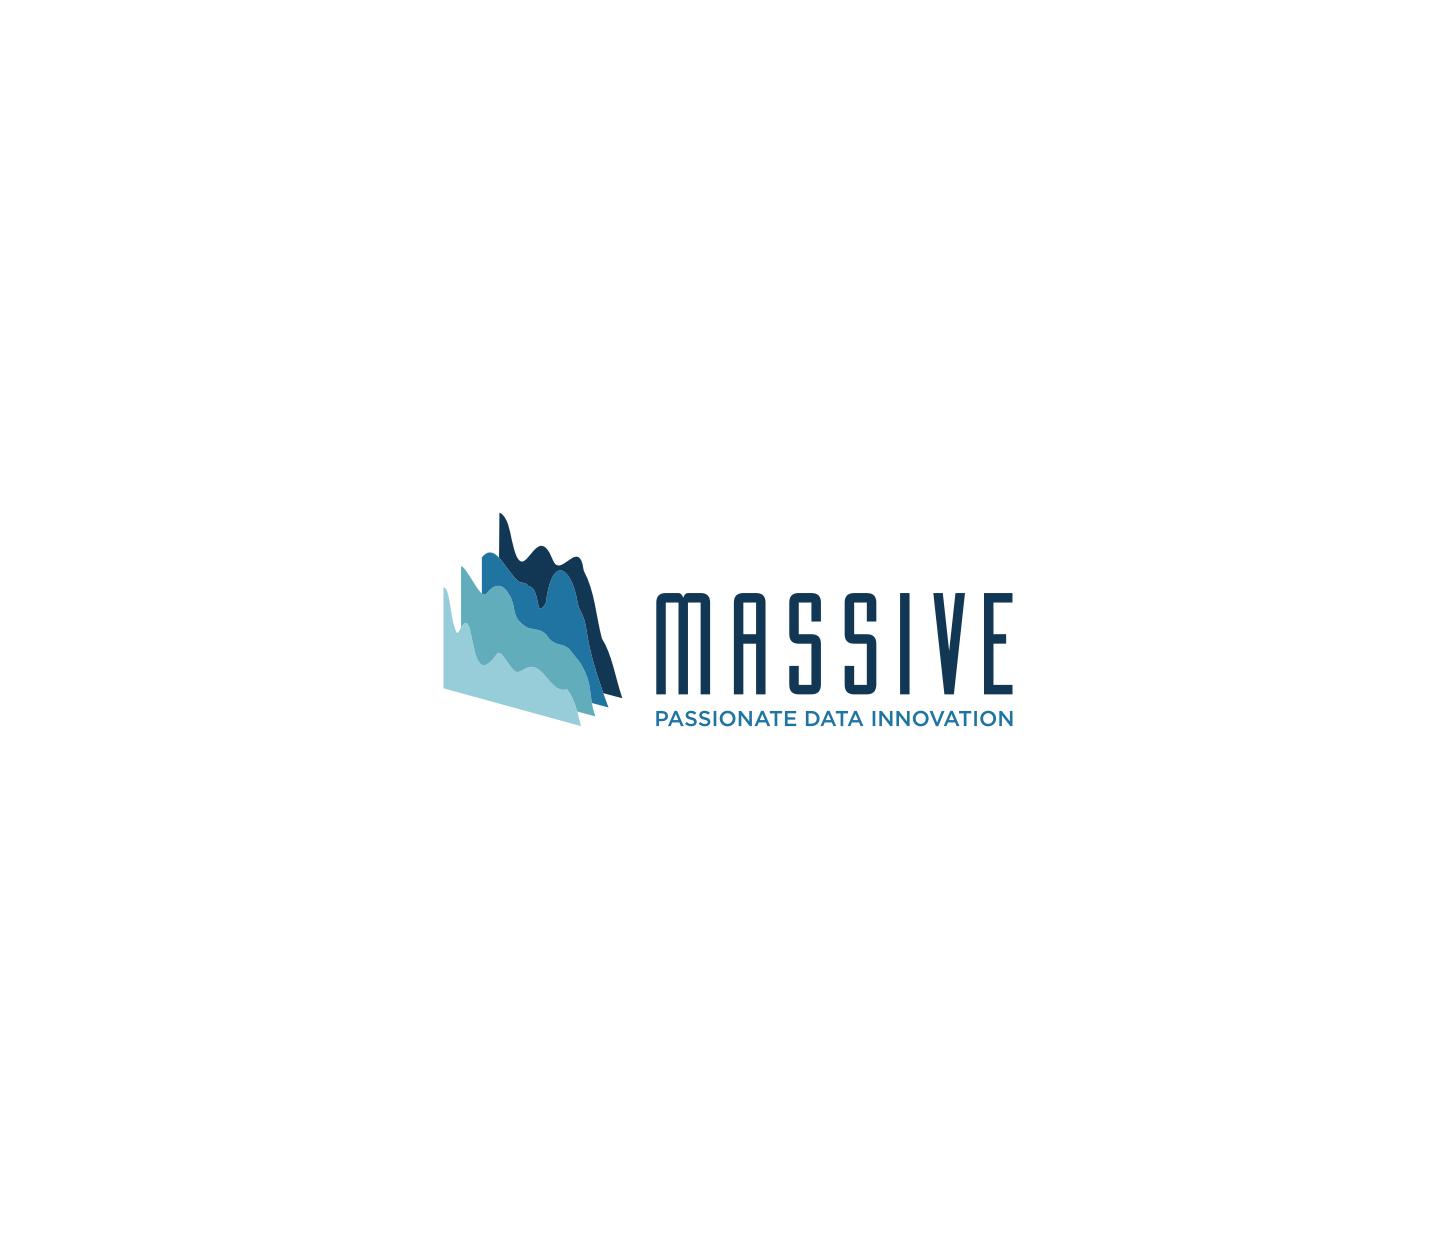 Logo Design by Sigitumarali Sigit - Entry No. 396 in the Logo Design Contest MASSIVE LOGO.